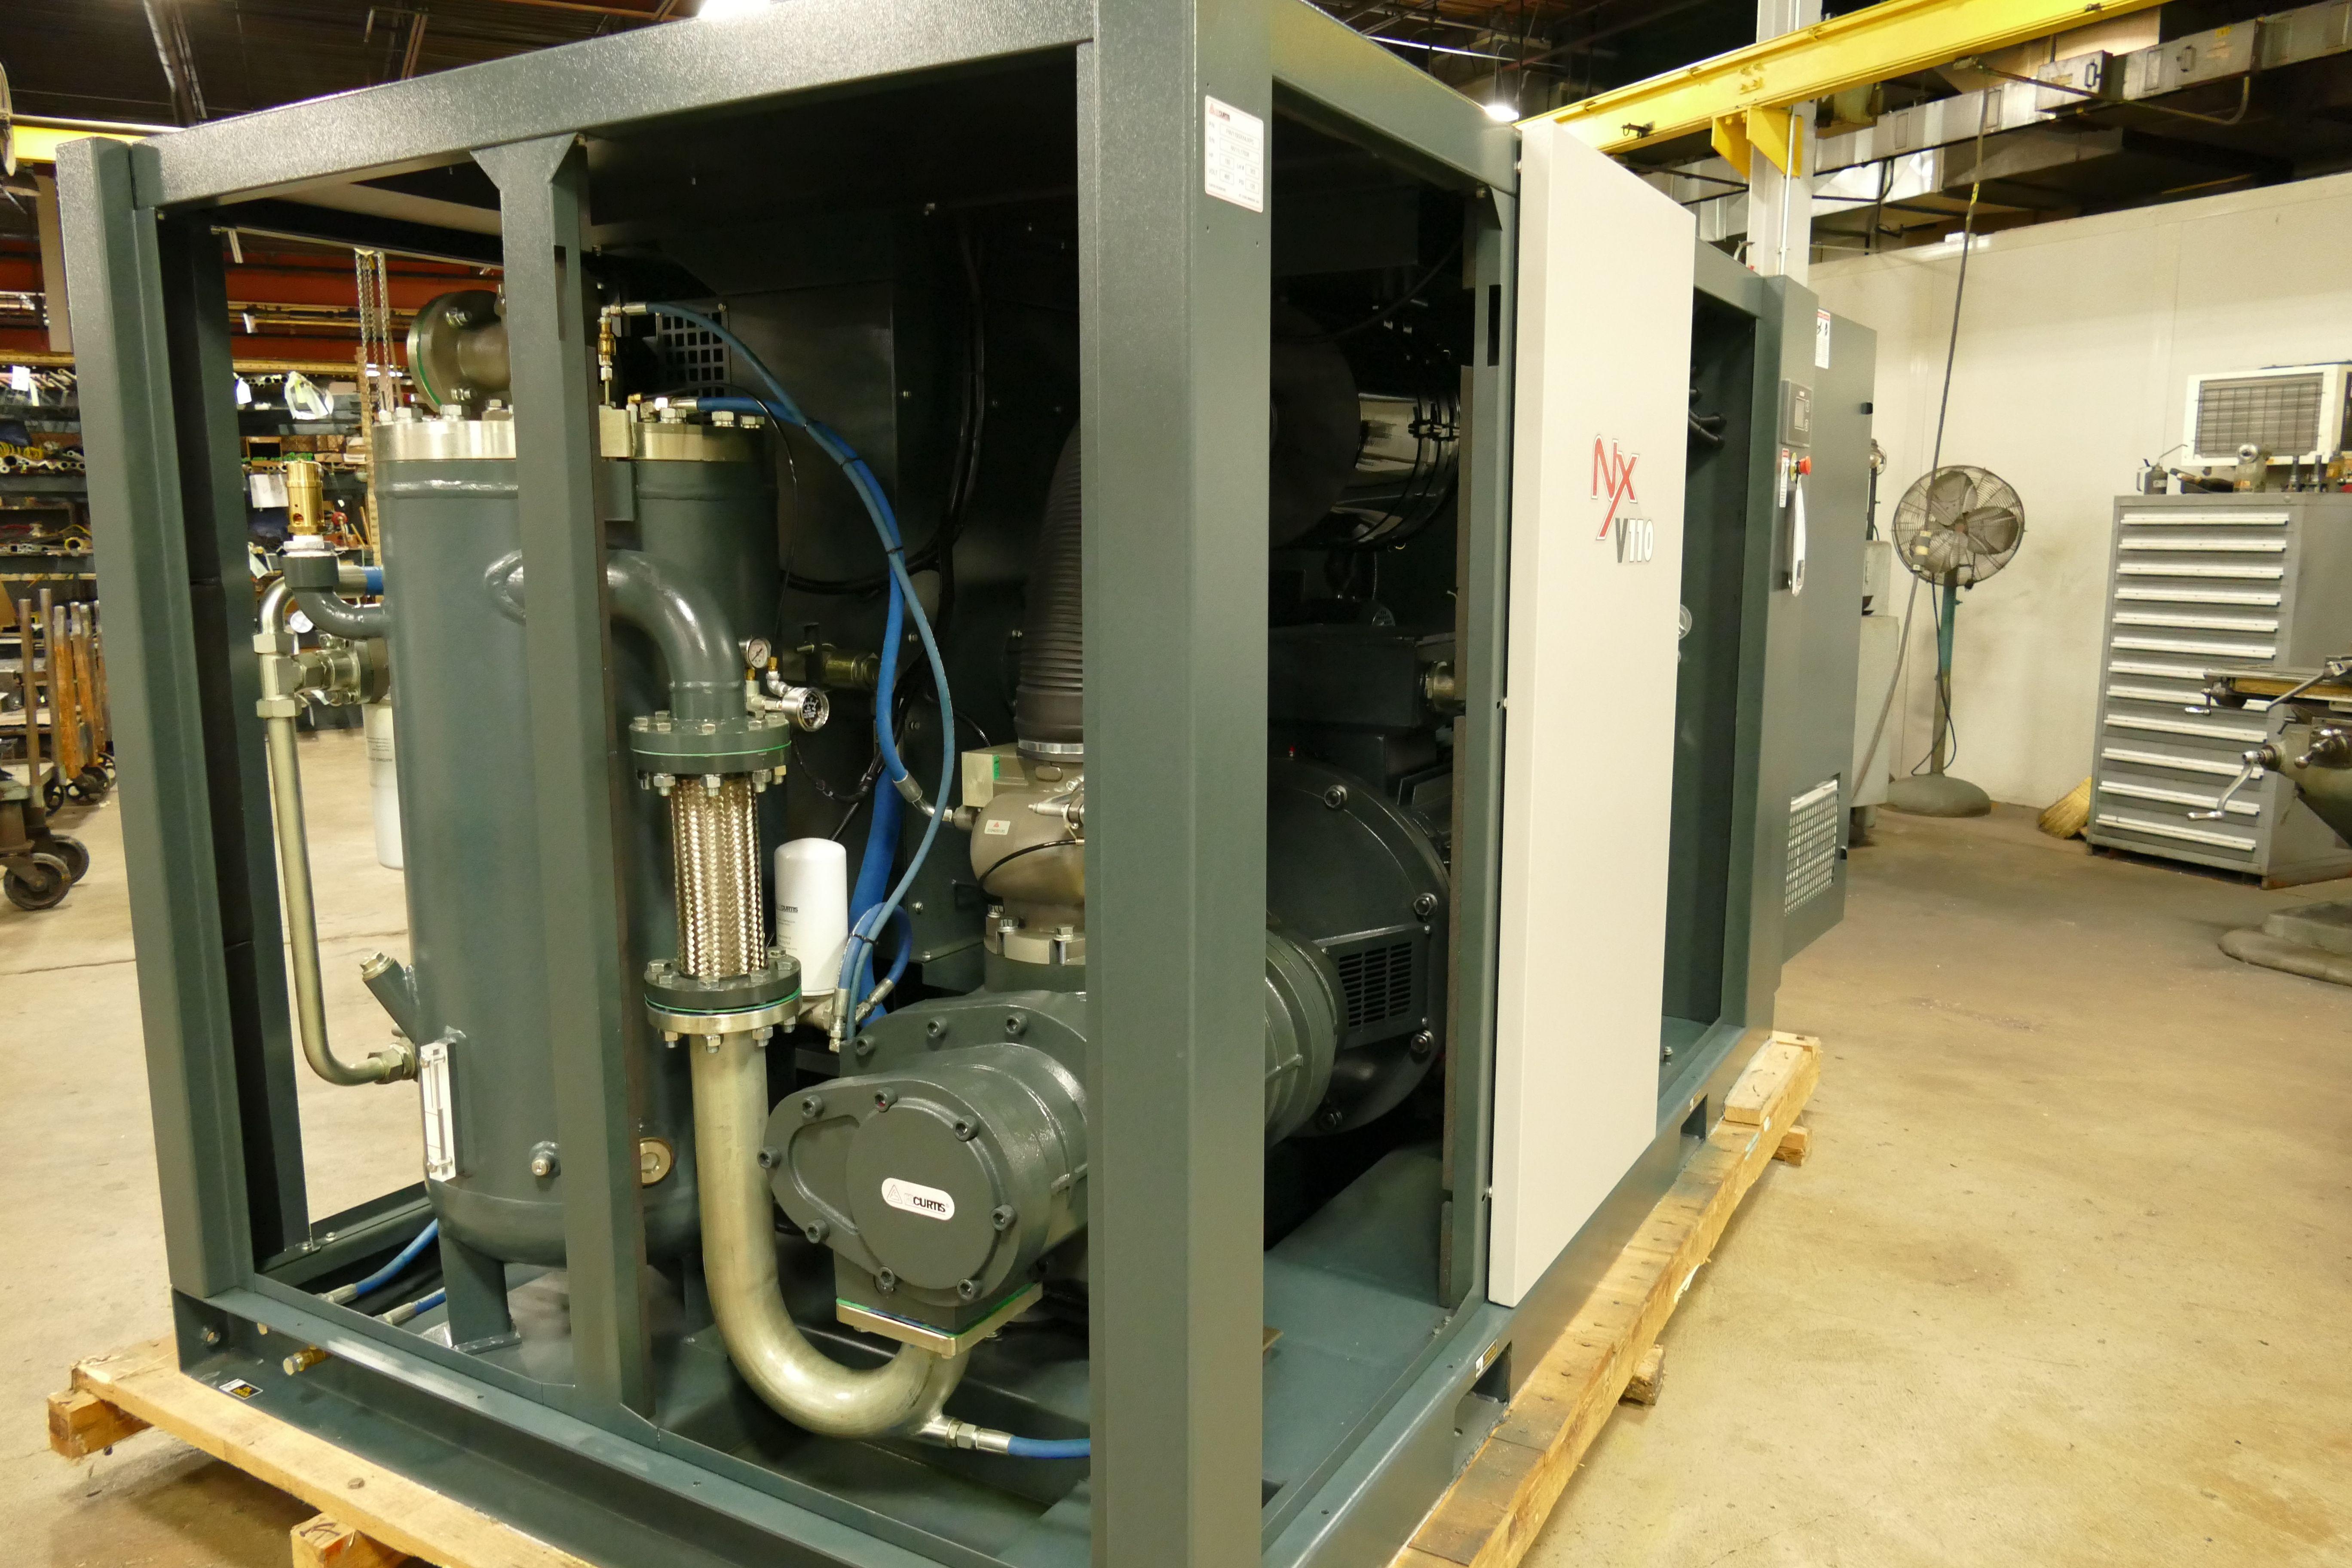 100HP ROTARY SCREW COMPRESSOR, AIR COMPRESSOR SERVICE